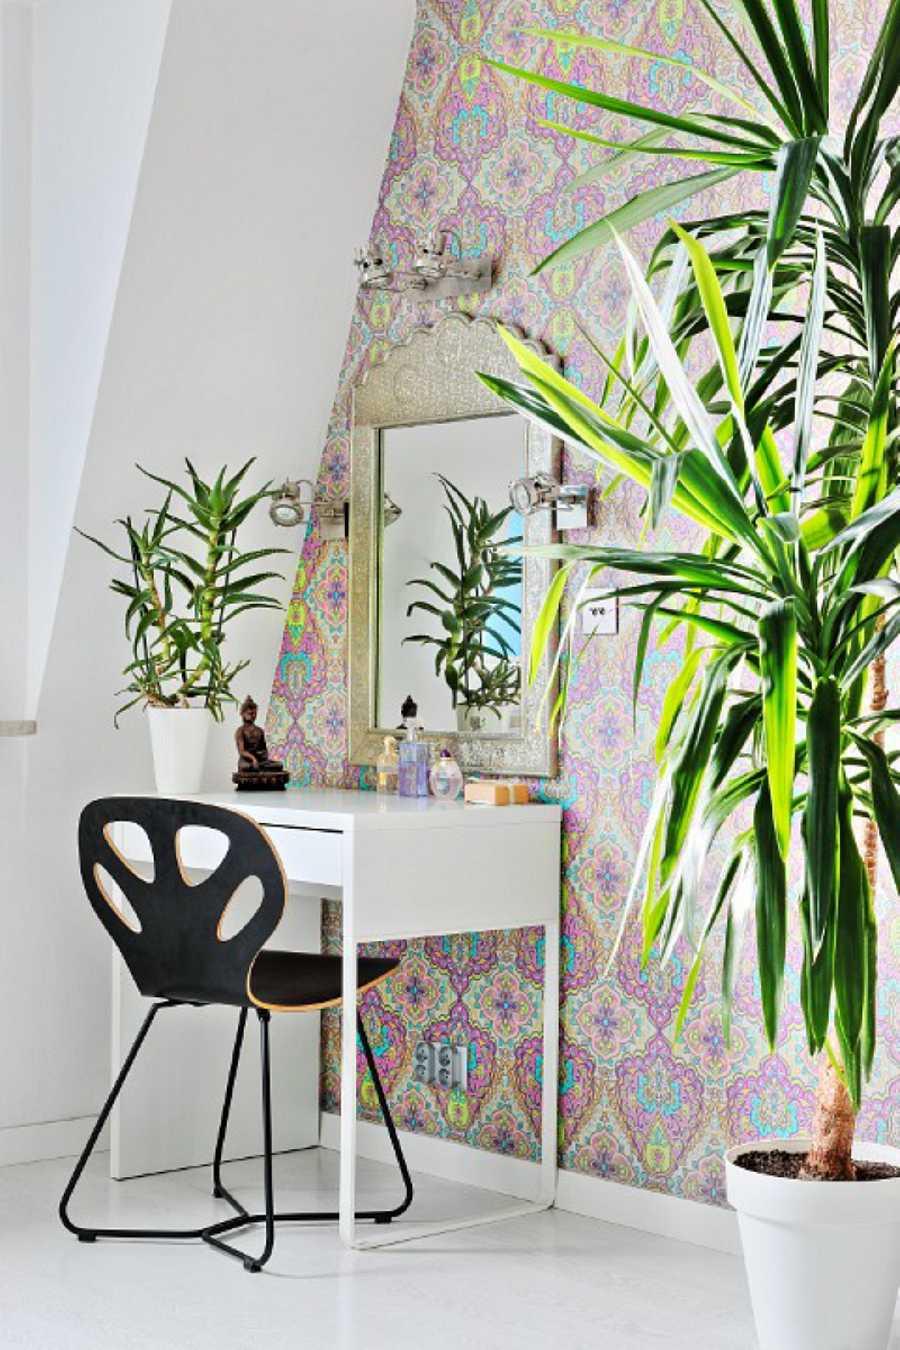 Planta de interior: la dracaena